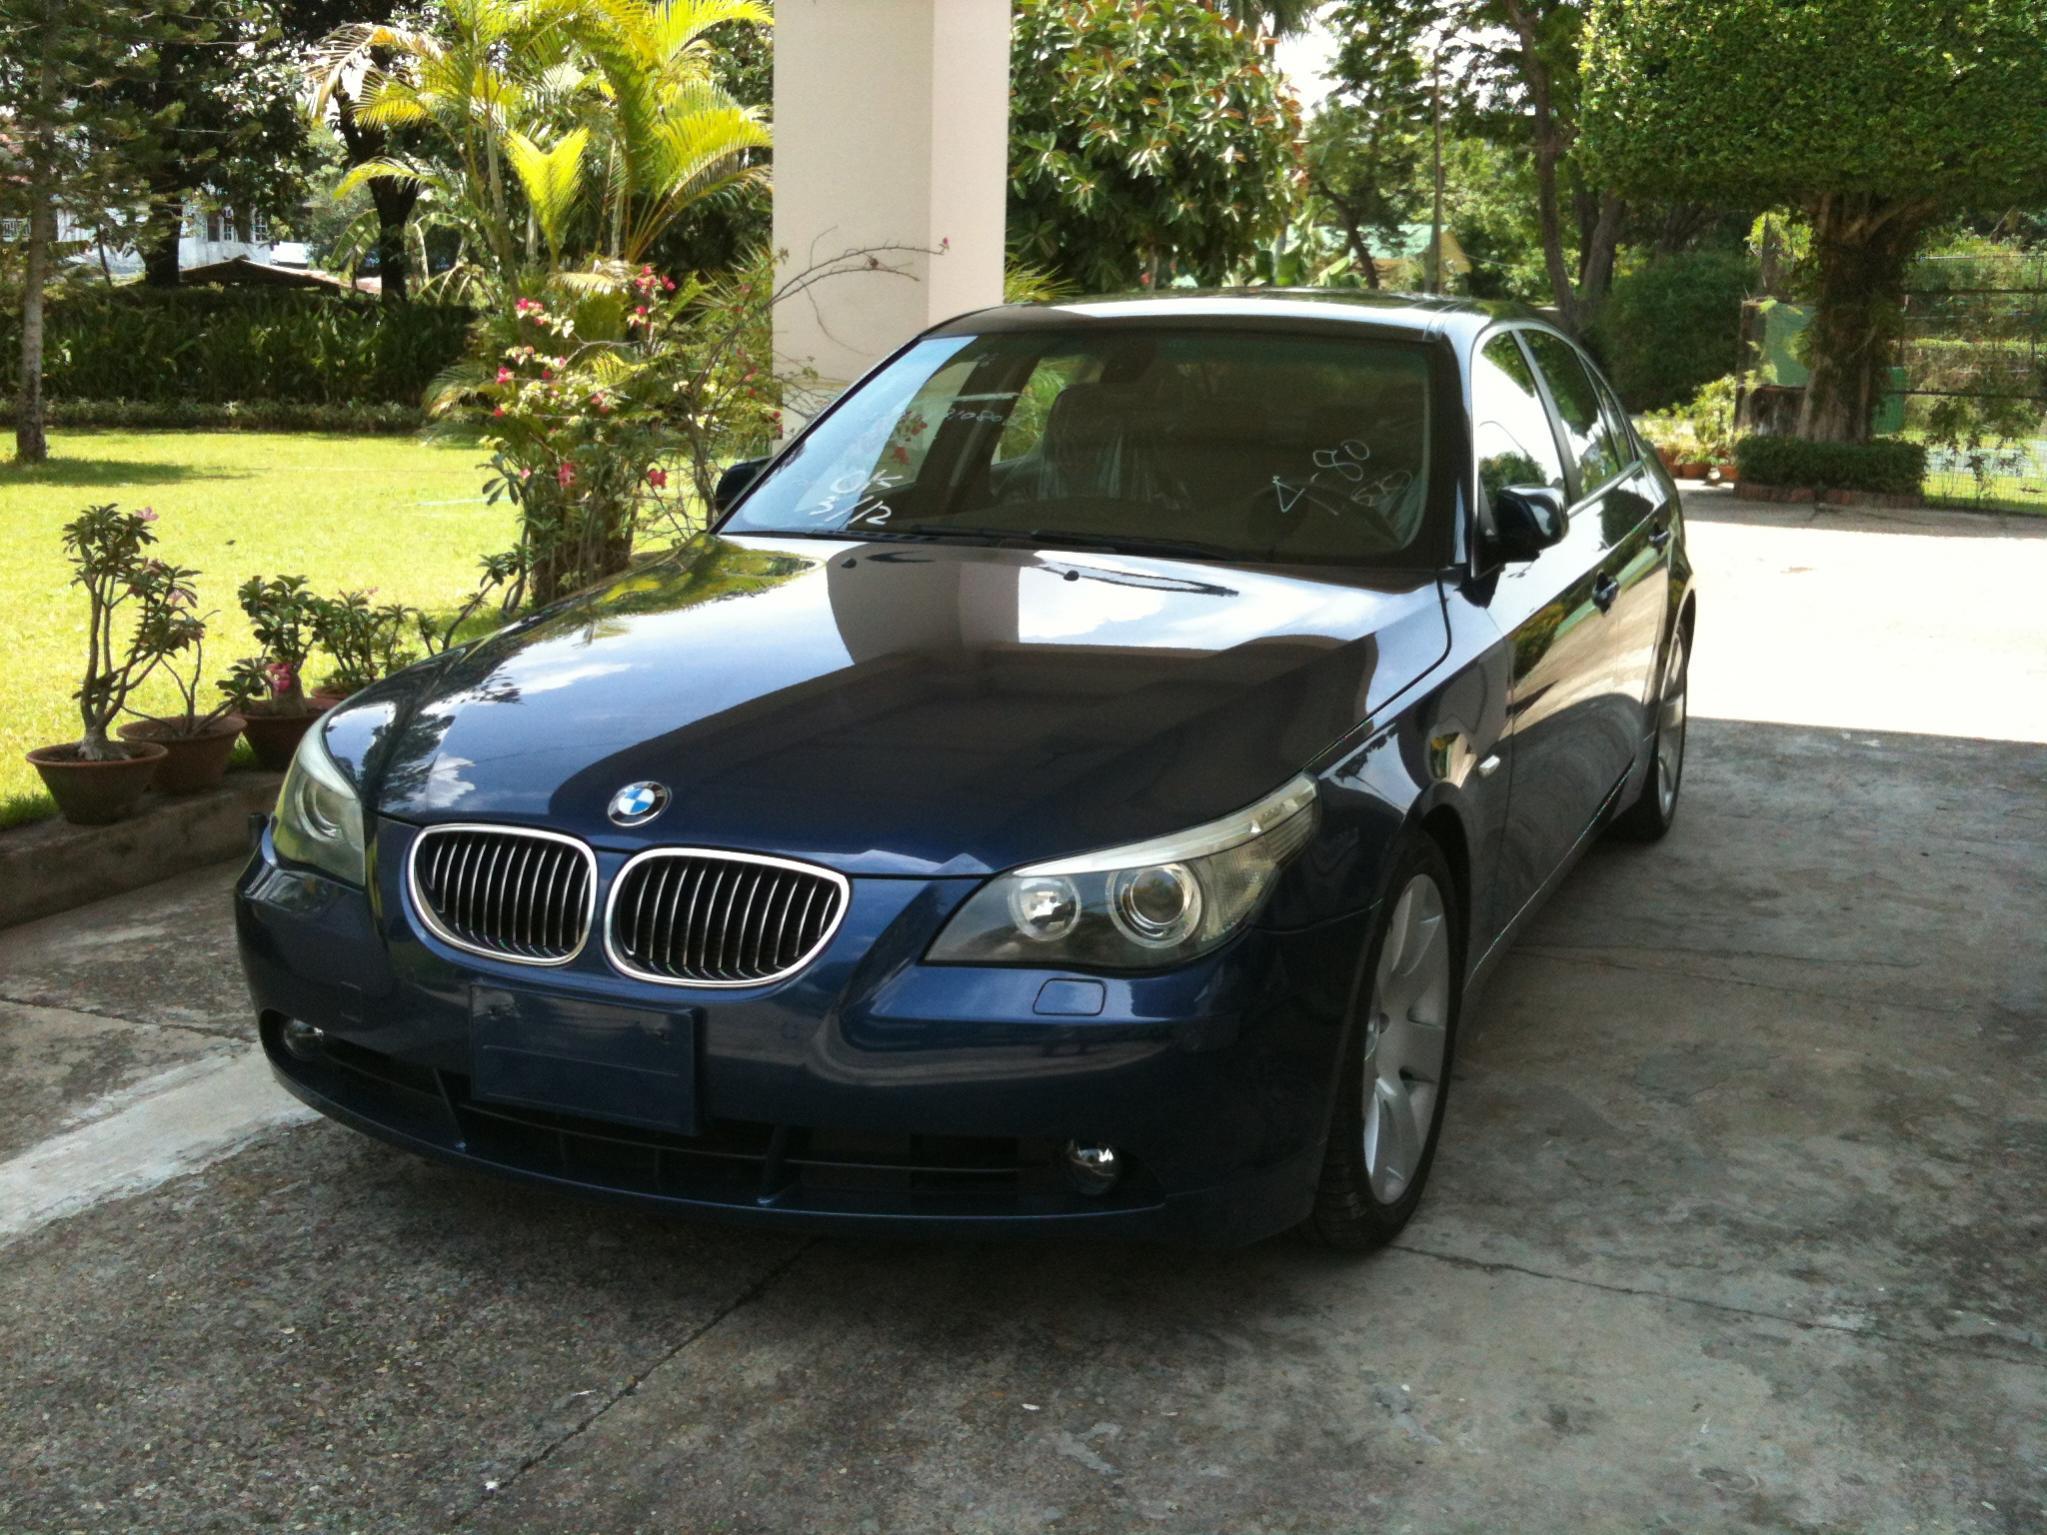 My Mystic Blue BMW 545i Year 2004 - BMW Forum - BimmerWerkz.com